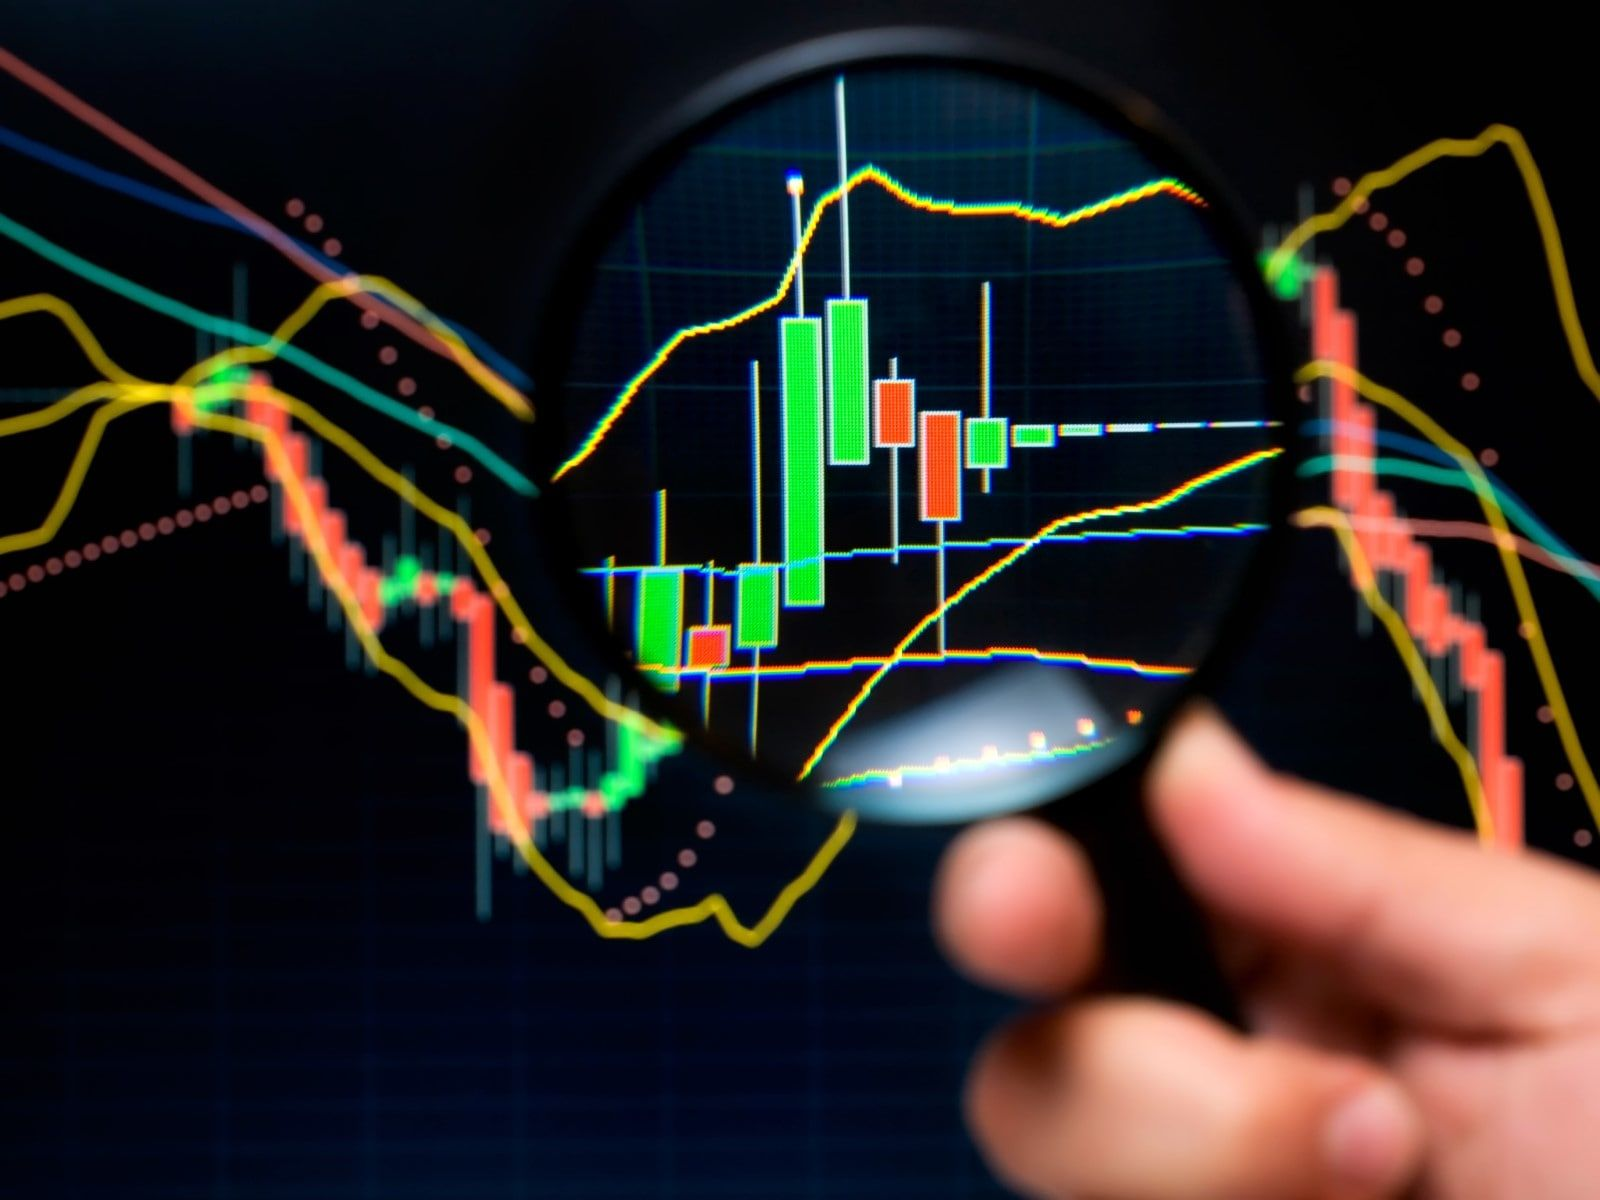 artikelserie technische analyse flatex cfd handelszeiten